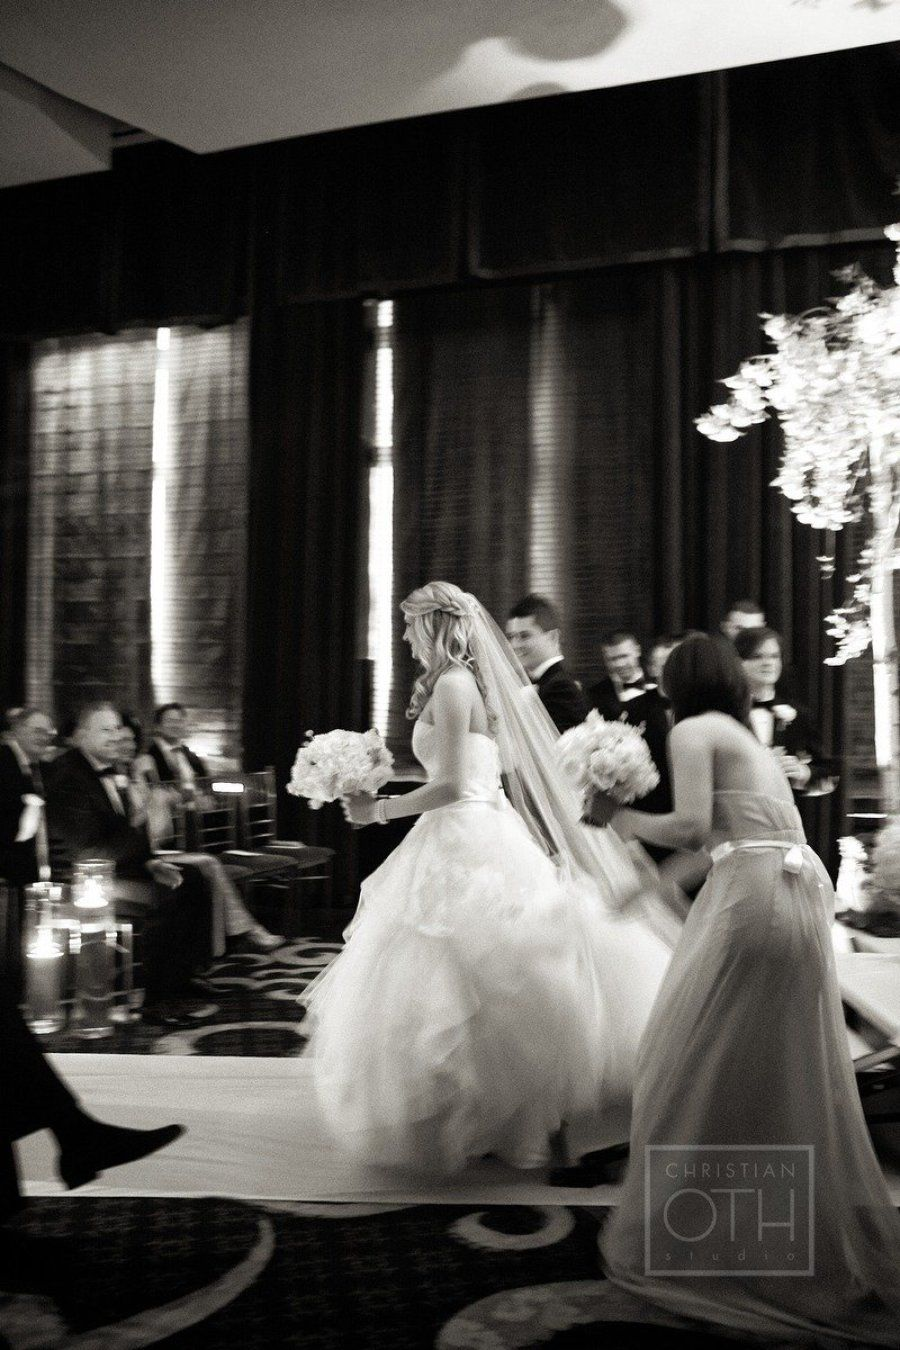 New york city hotel wedding from christian oth studio hotel